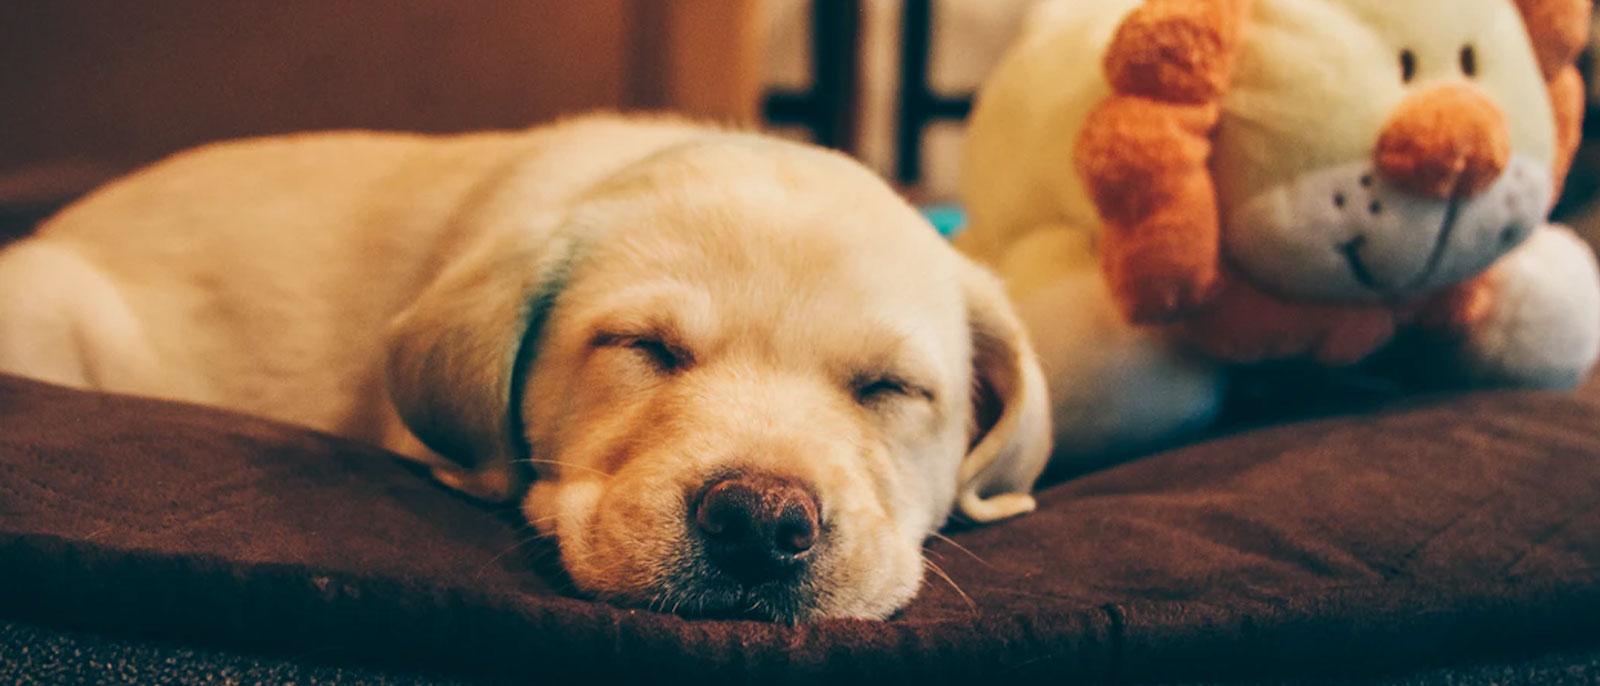 Top 10 Ways to Calm Your Anxious Dog